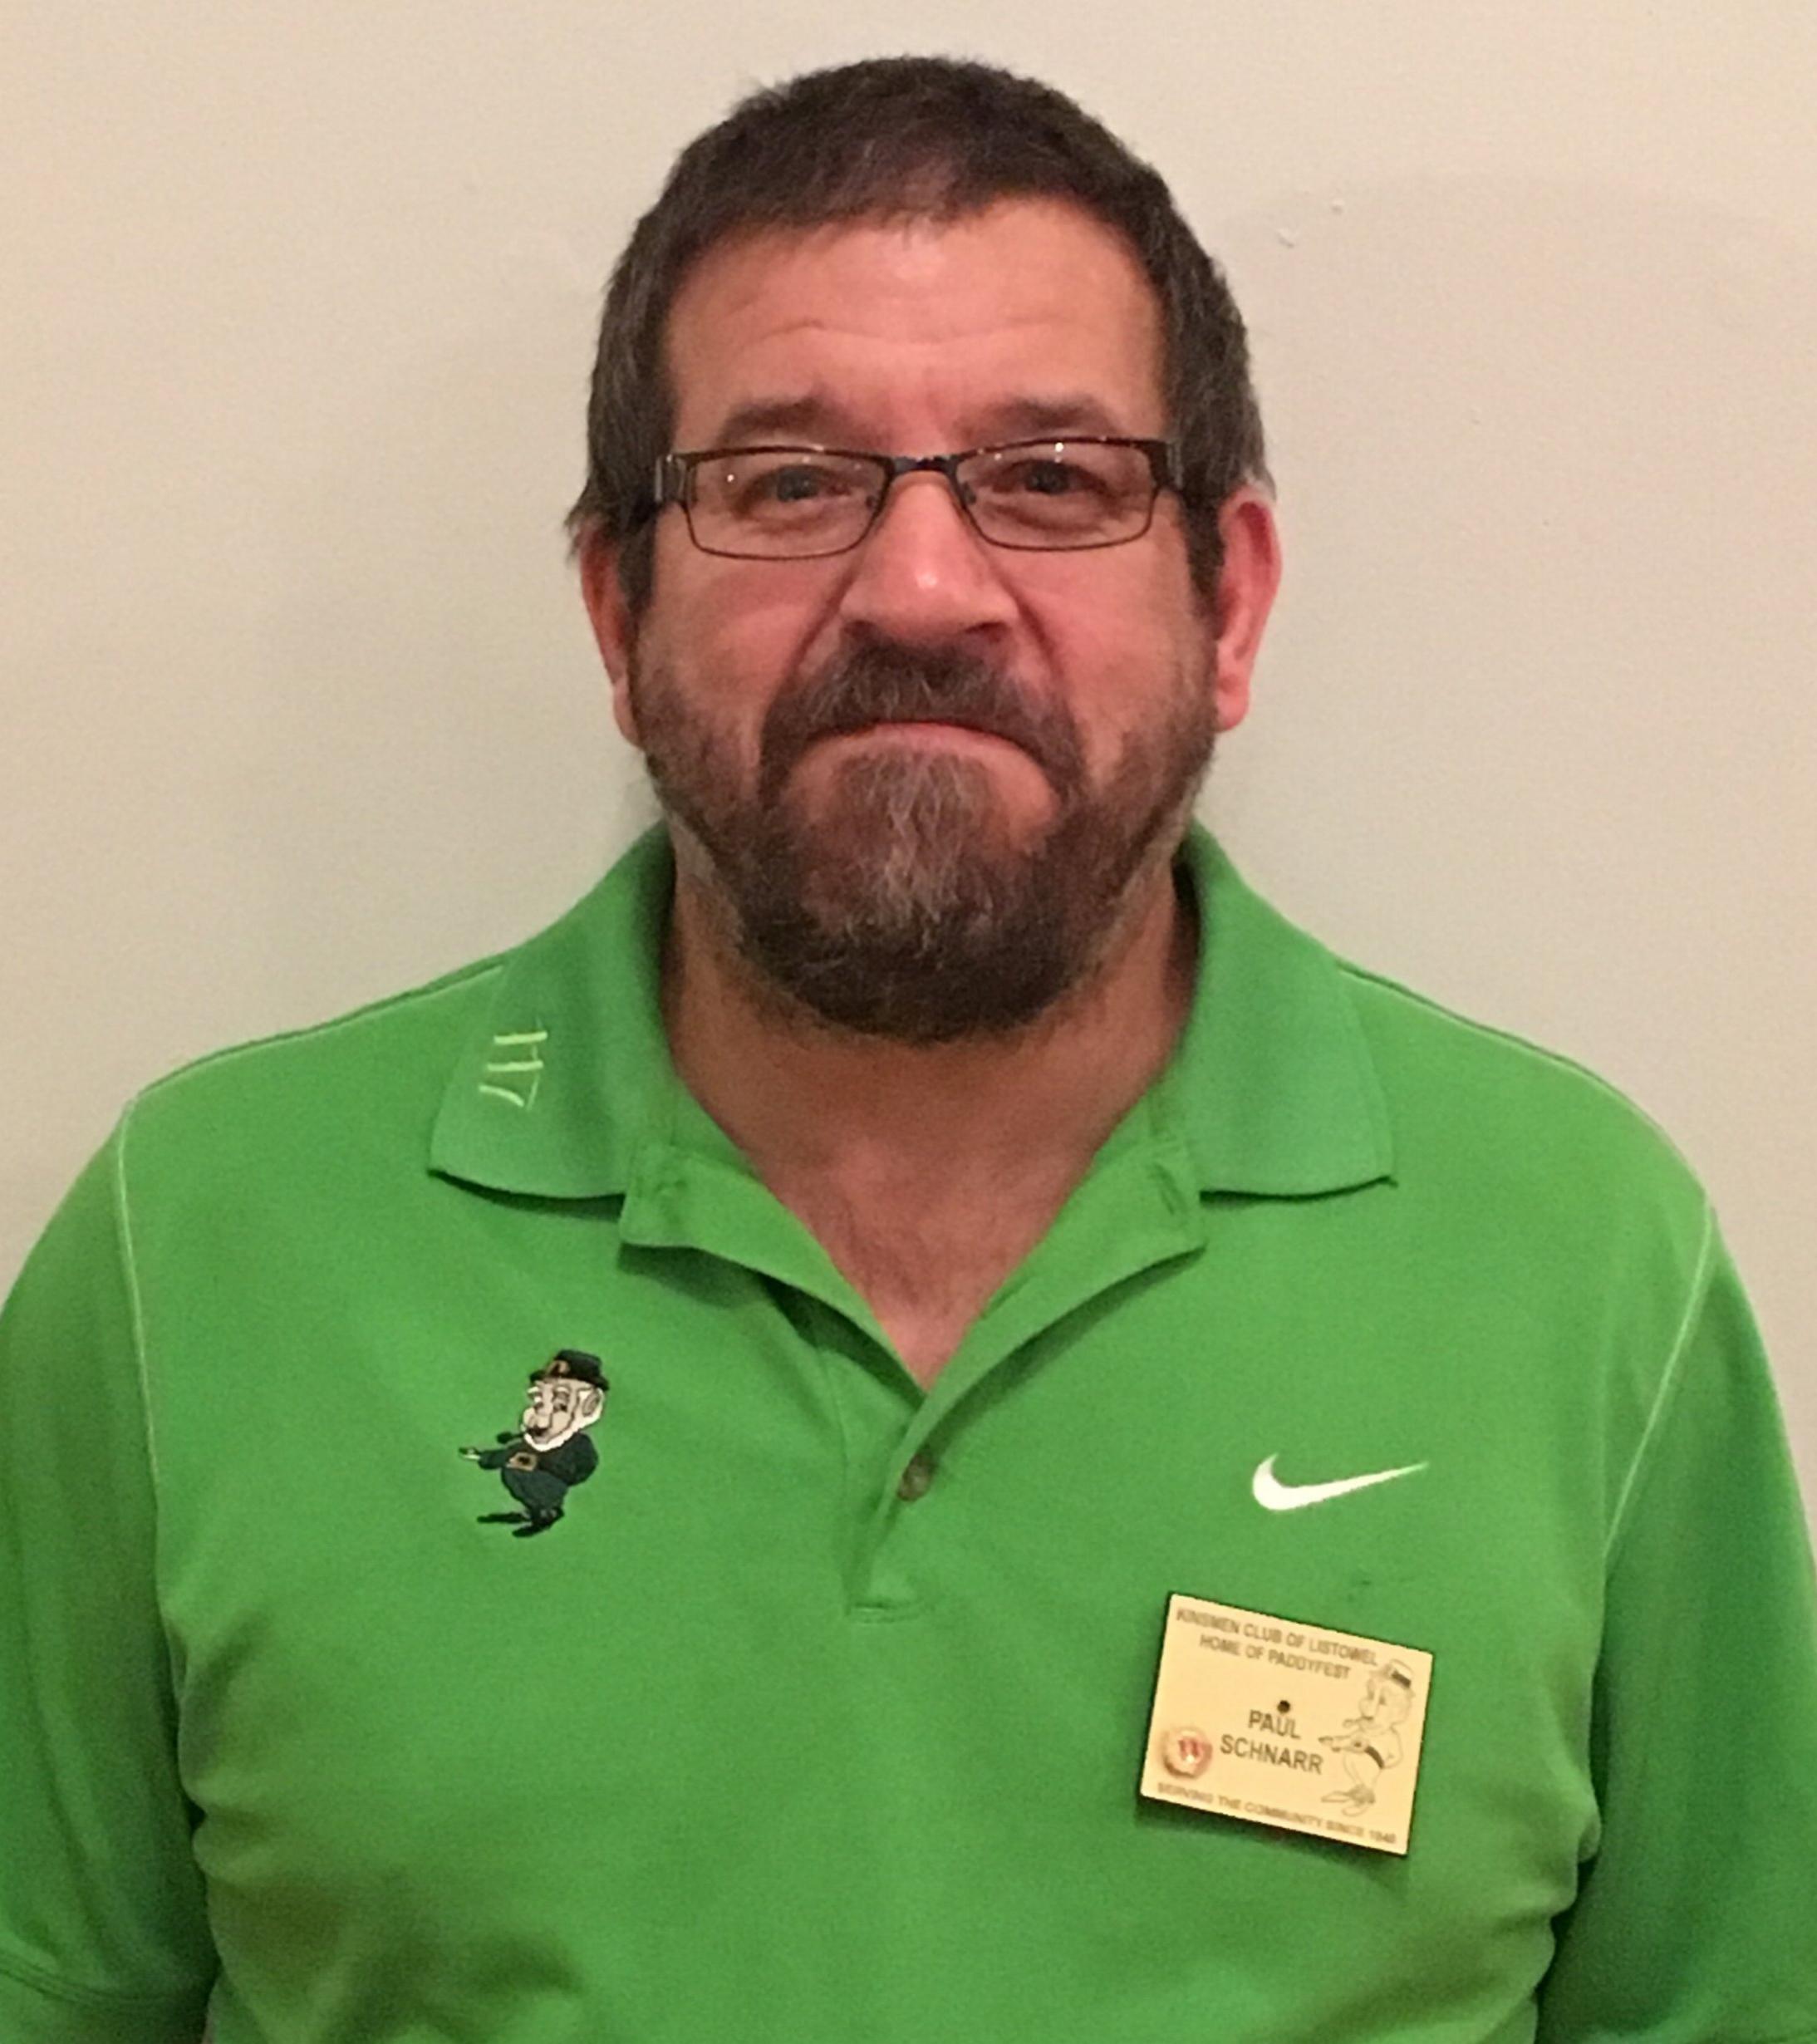 Paul Schnarr Kinsmen District Governor, 10th year Kinsmen Master Technician at Hudson's Listowel Kia